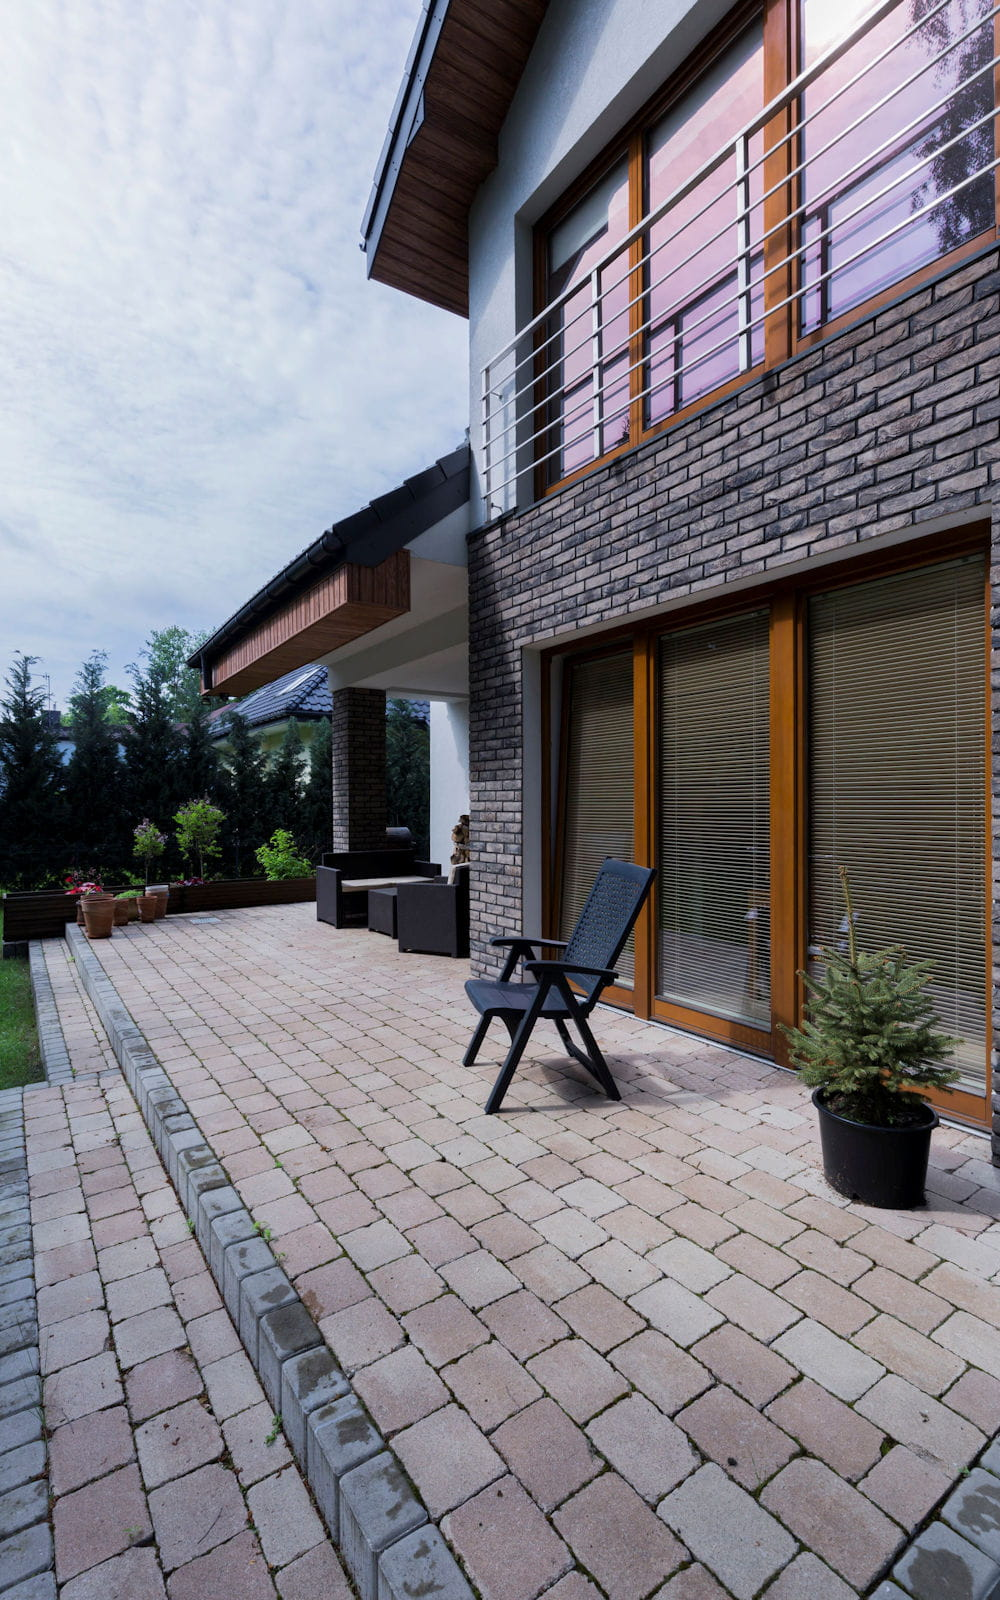 Comment Nettoyer La Terrasse En Pierre nettoyer le sol d'une terrasse en pierre naturelle